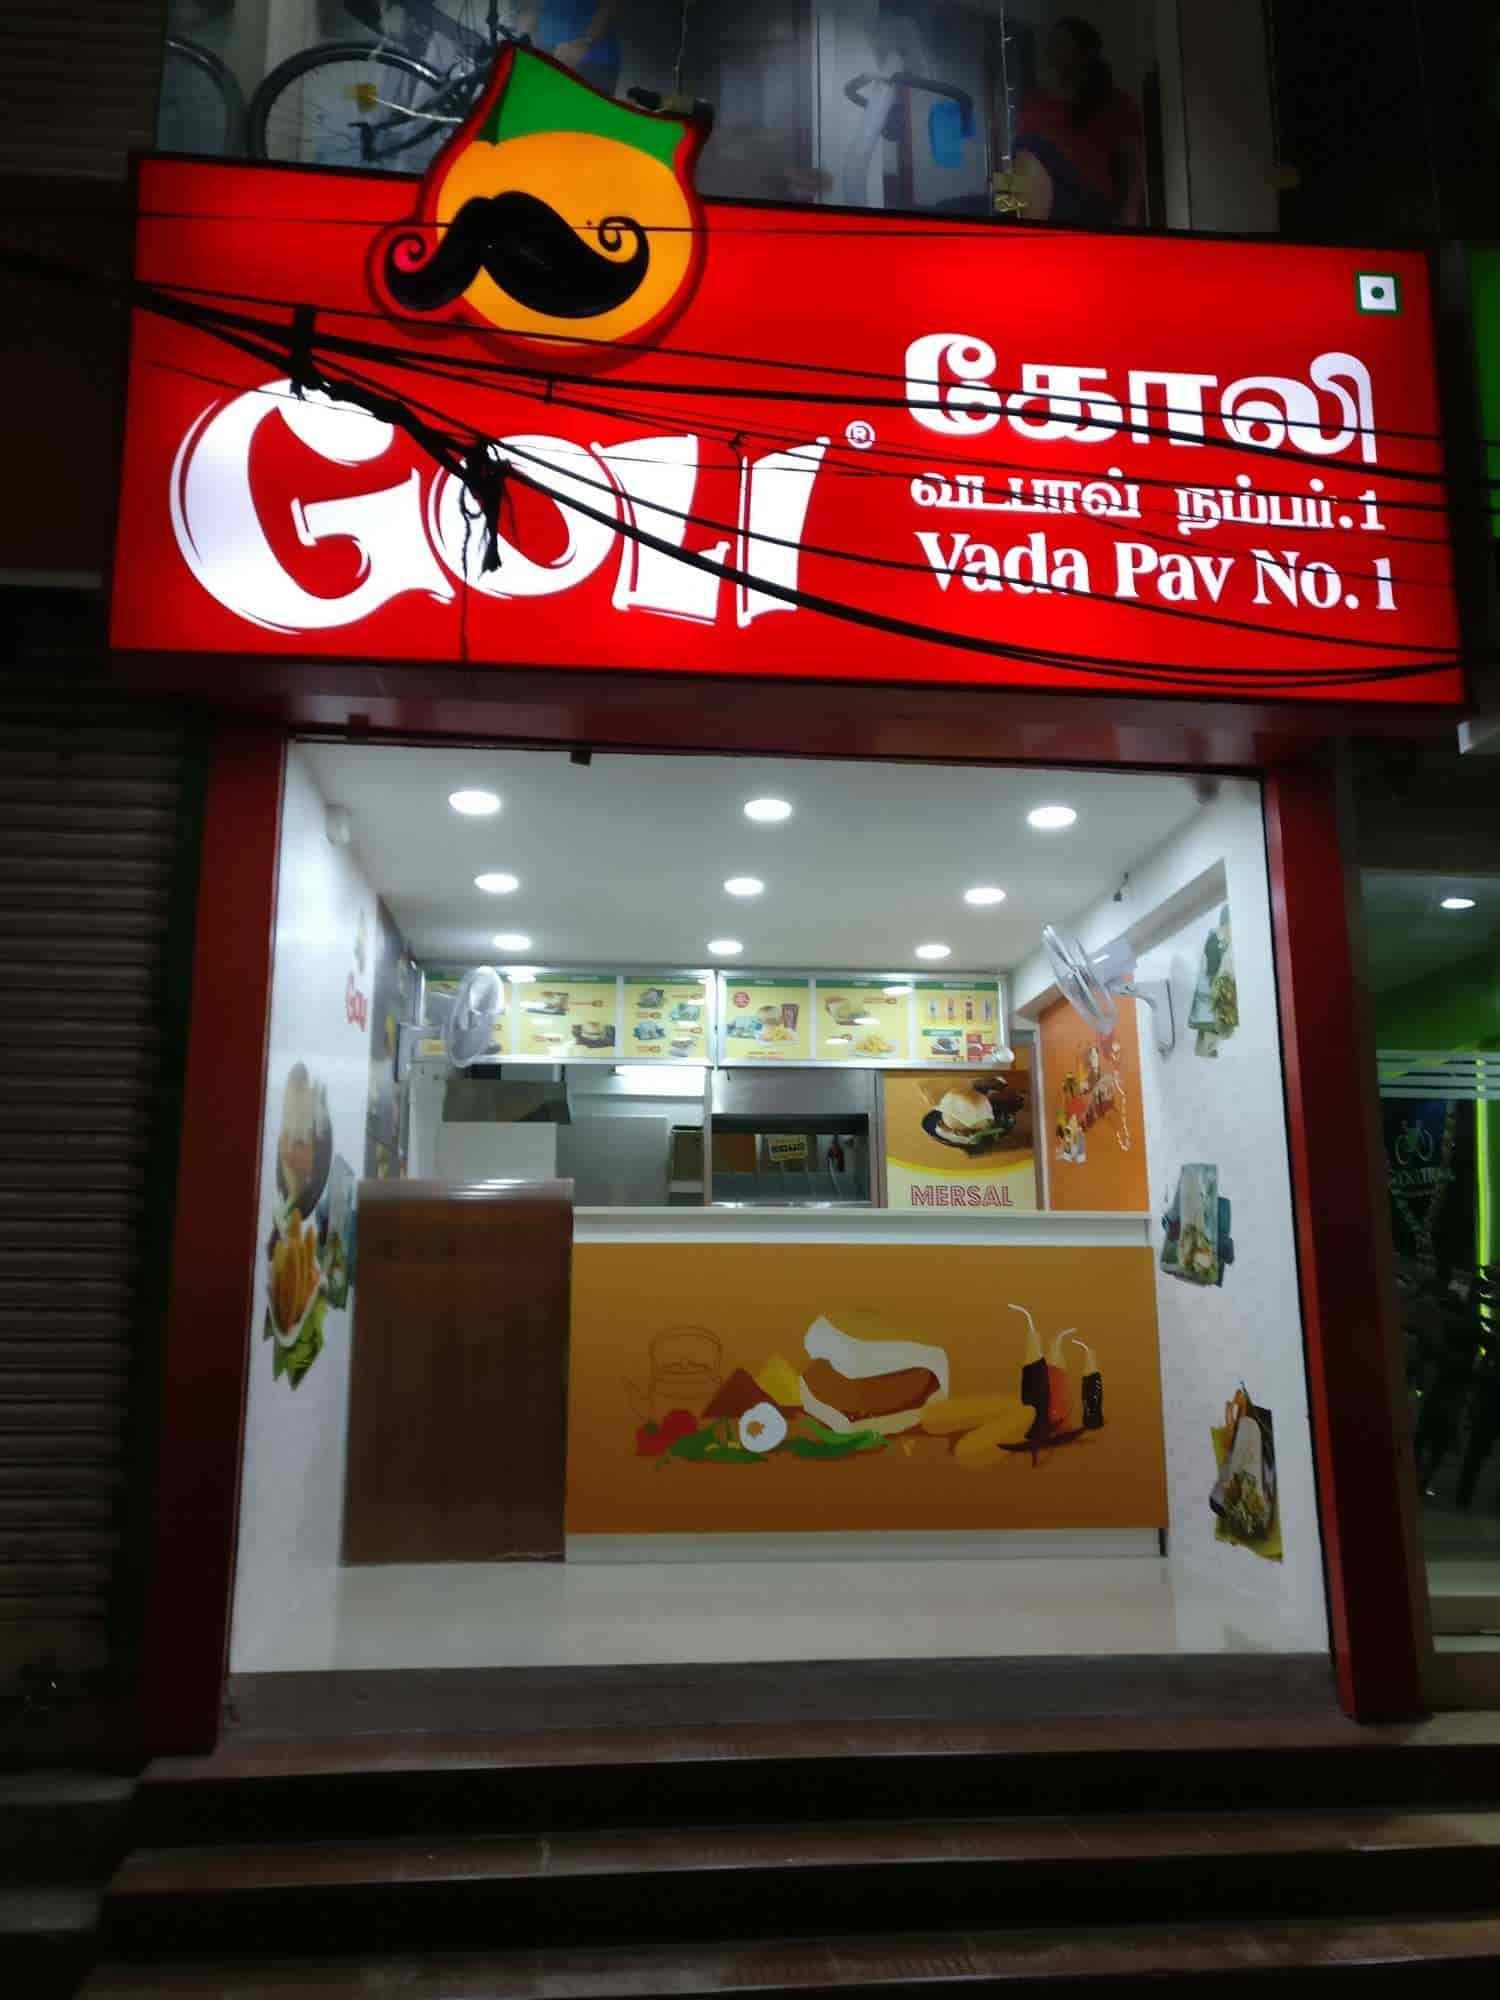 Goli Vada Pav No 1, Porur - Fast Food in Chennai - Justdial